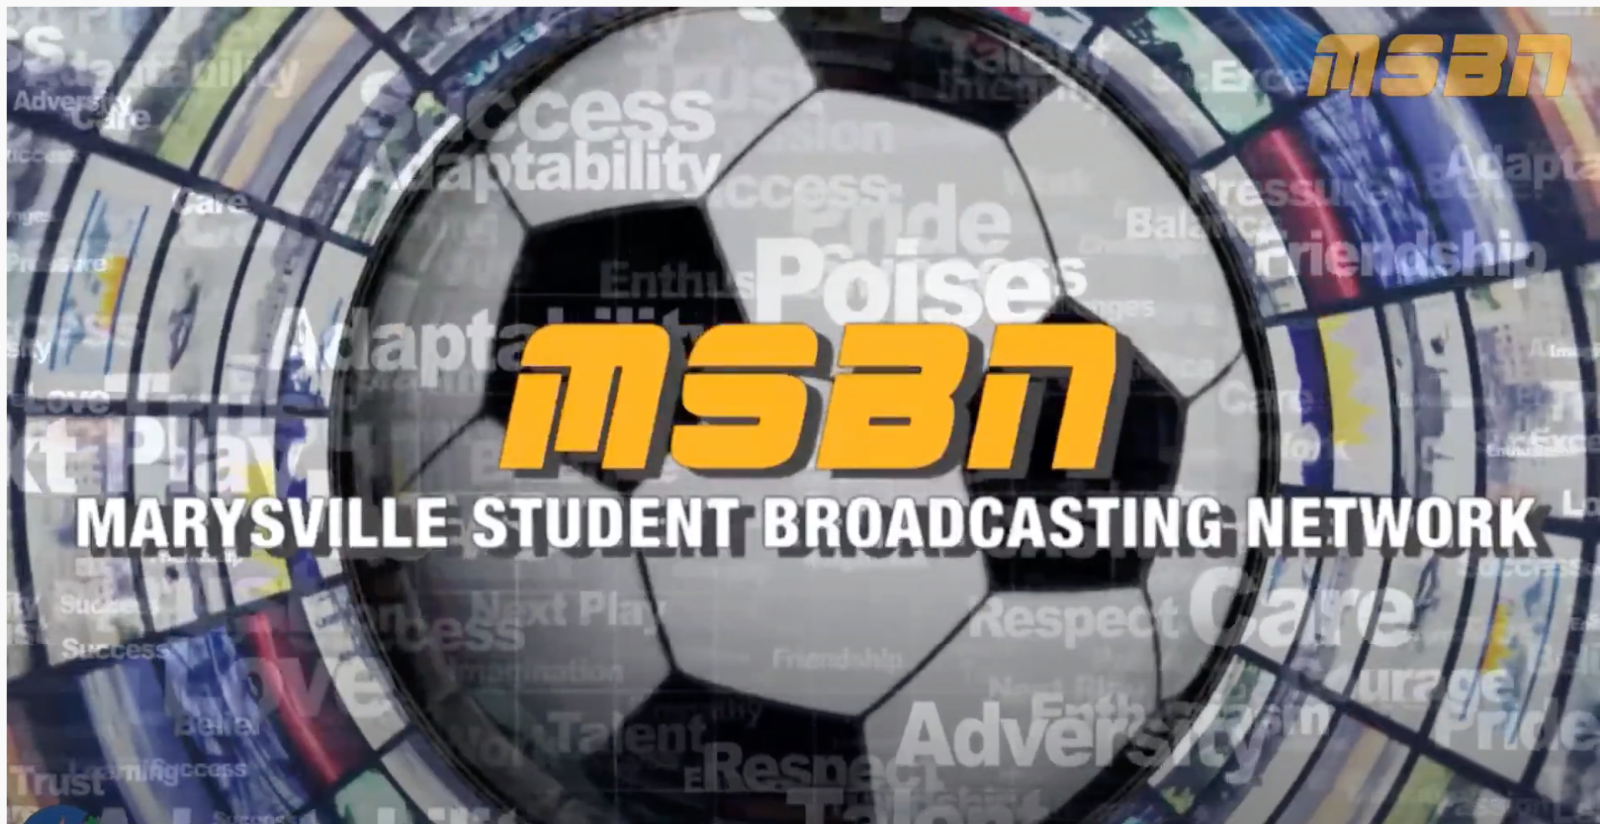 Marysville Student Broadcasting Network